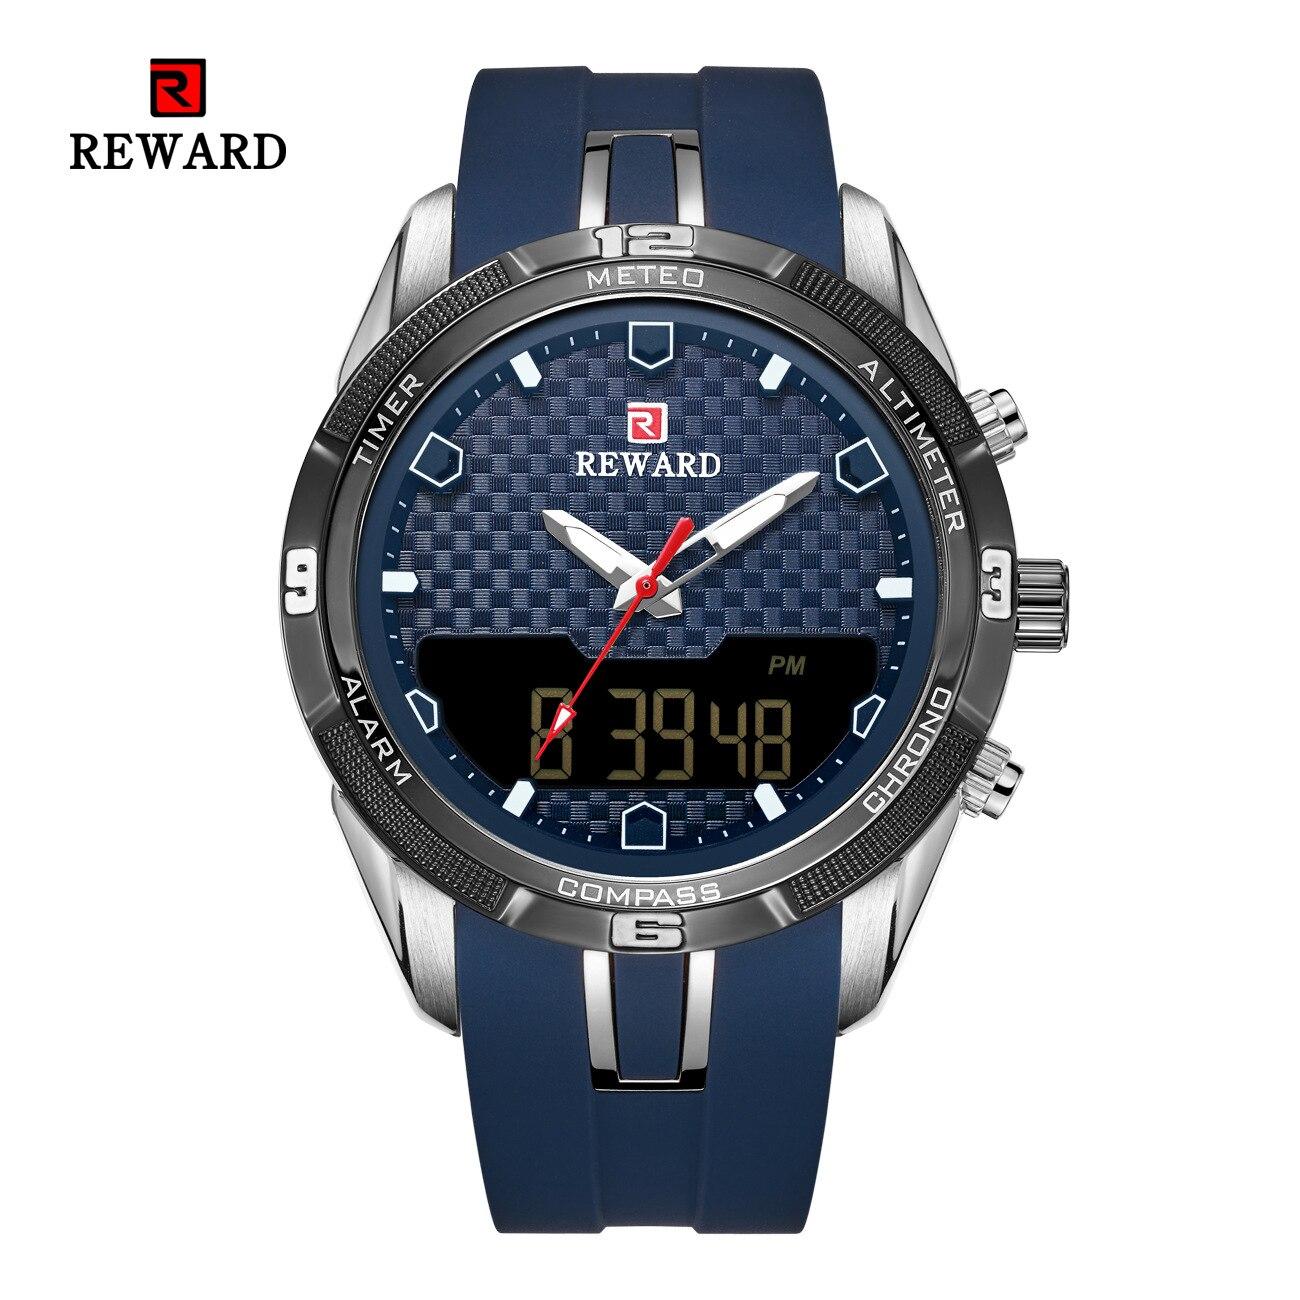 Herren Uhren Reward 3bar Water Resistant LED Silicone Dual Movement Digital Electronic Watch Men's Sports Smart Wristwatches